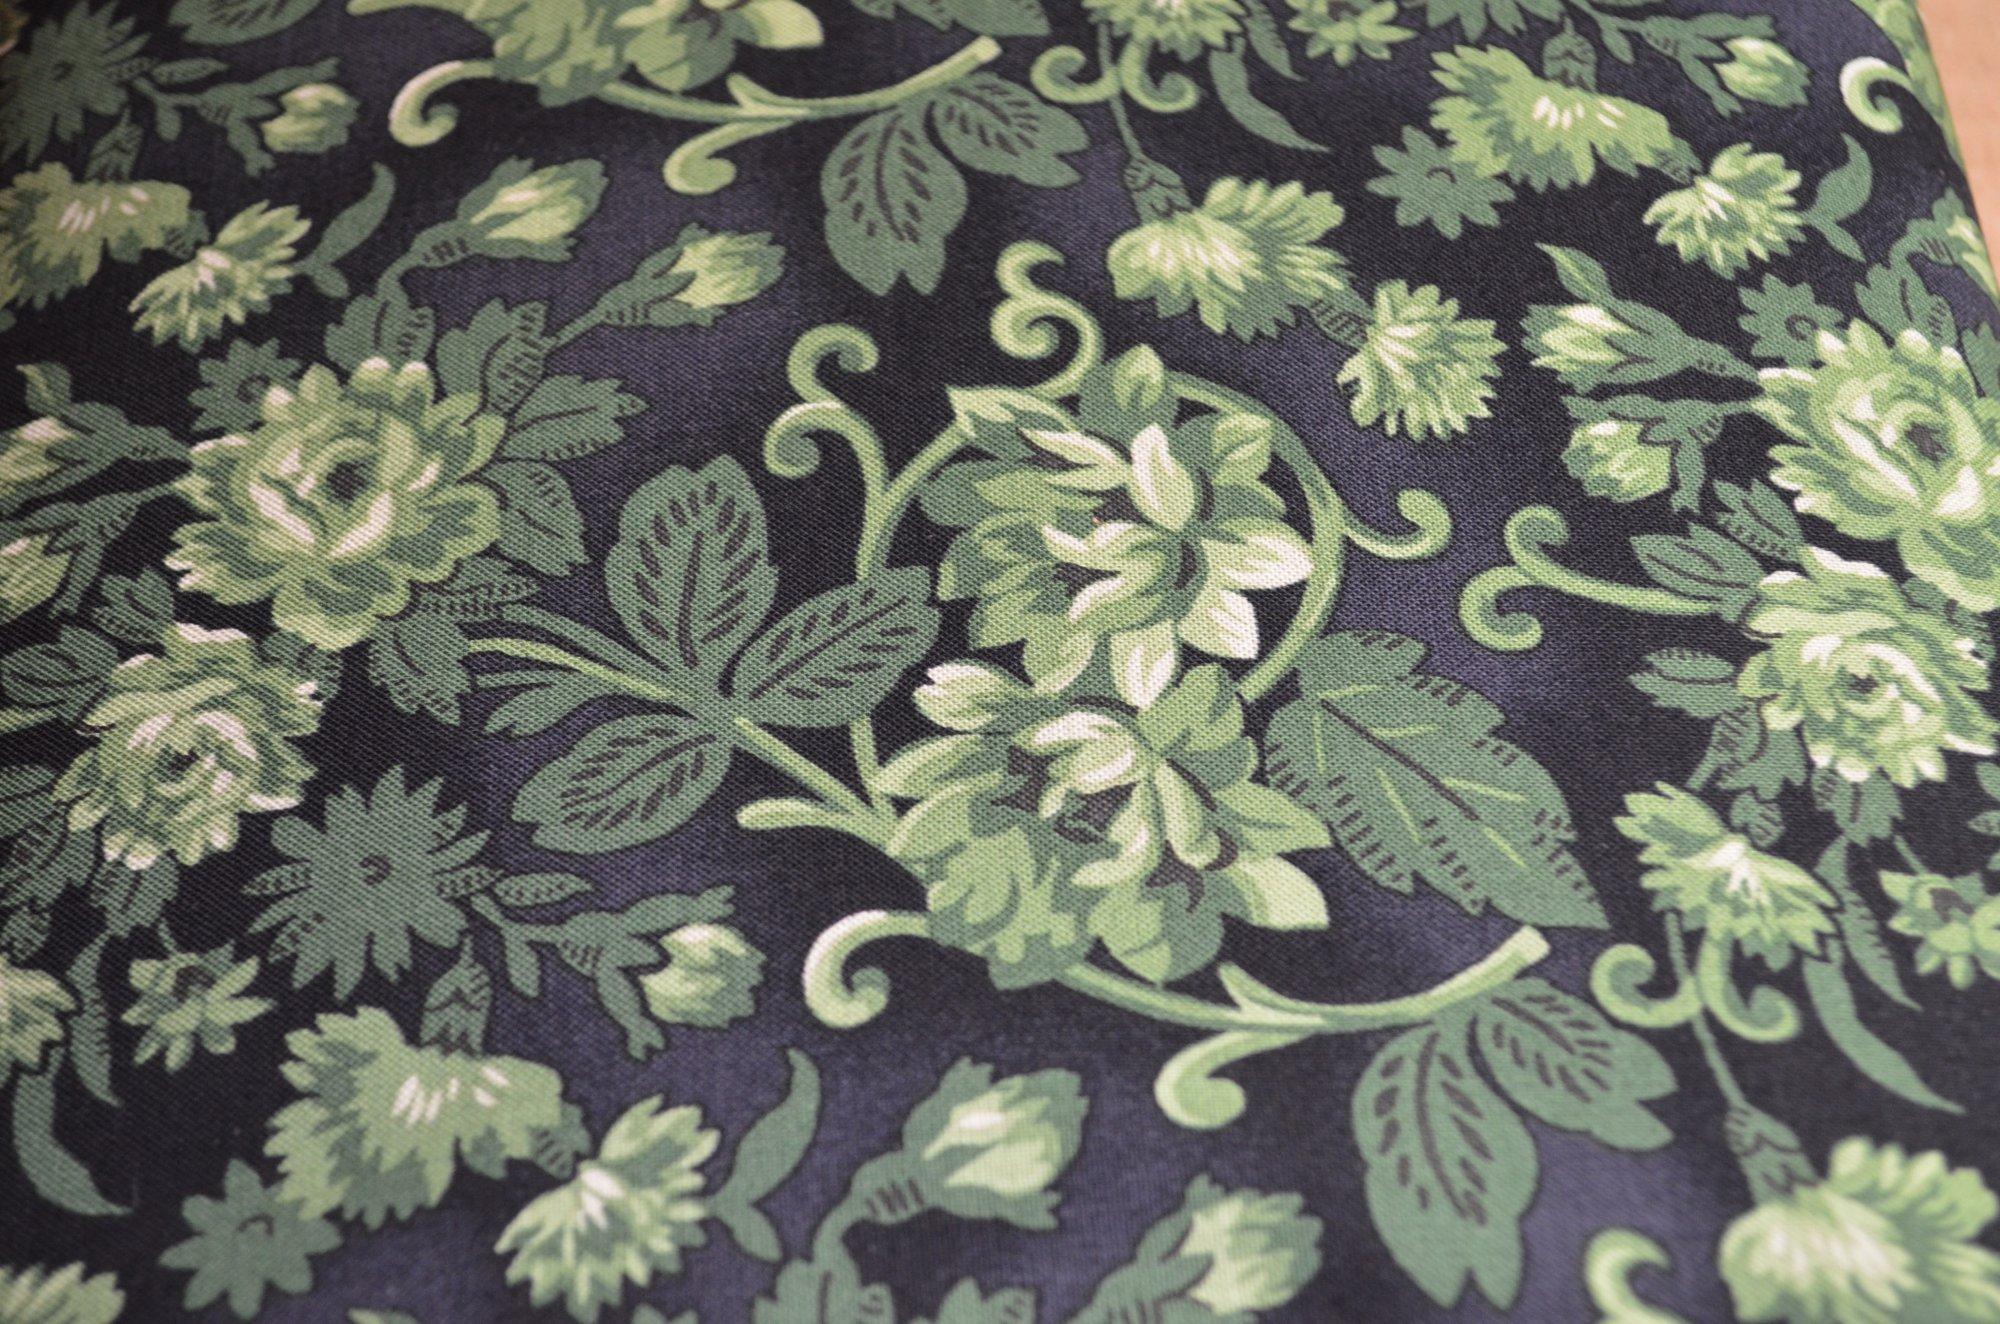 Washington Street Studio Christmas Remembered 47156649GRE1 Green Floral